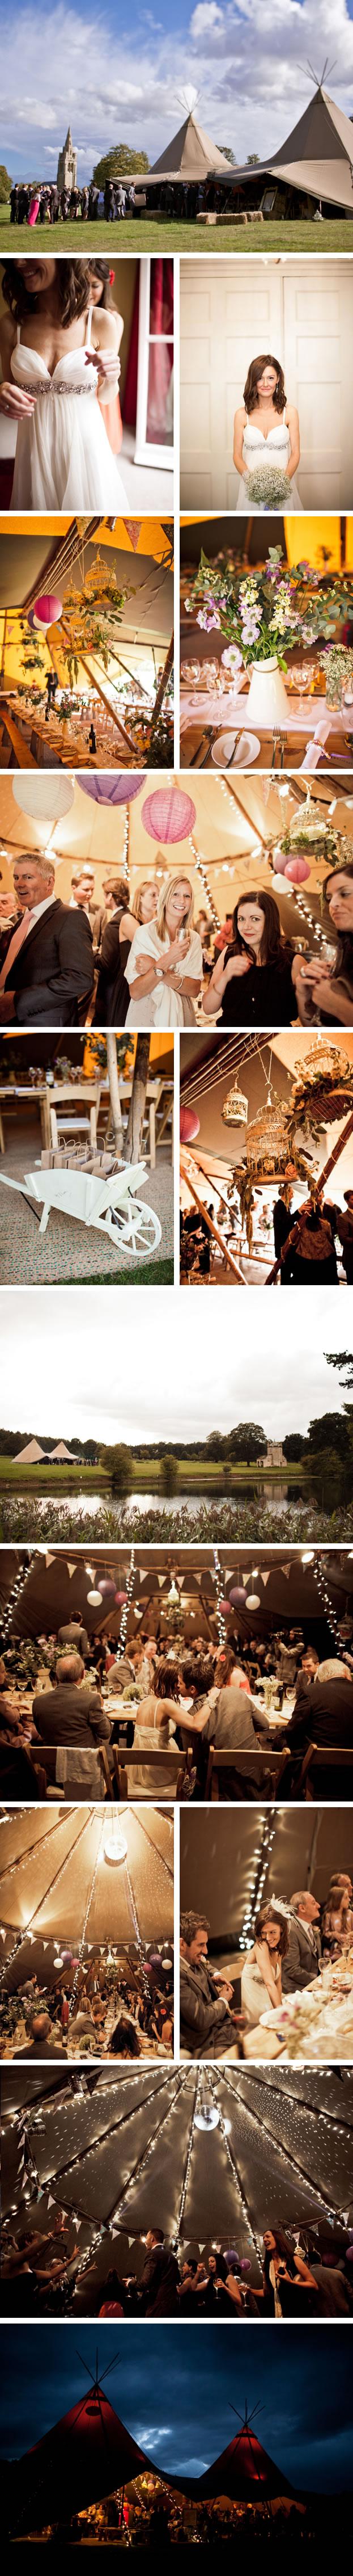 Nina & Graeme PapaKata Teepee Wedding Exton Park, Rutland